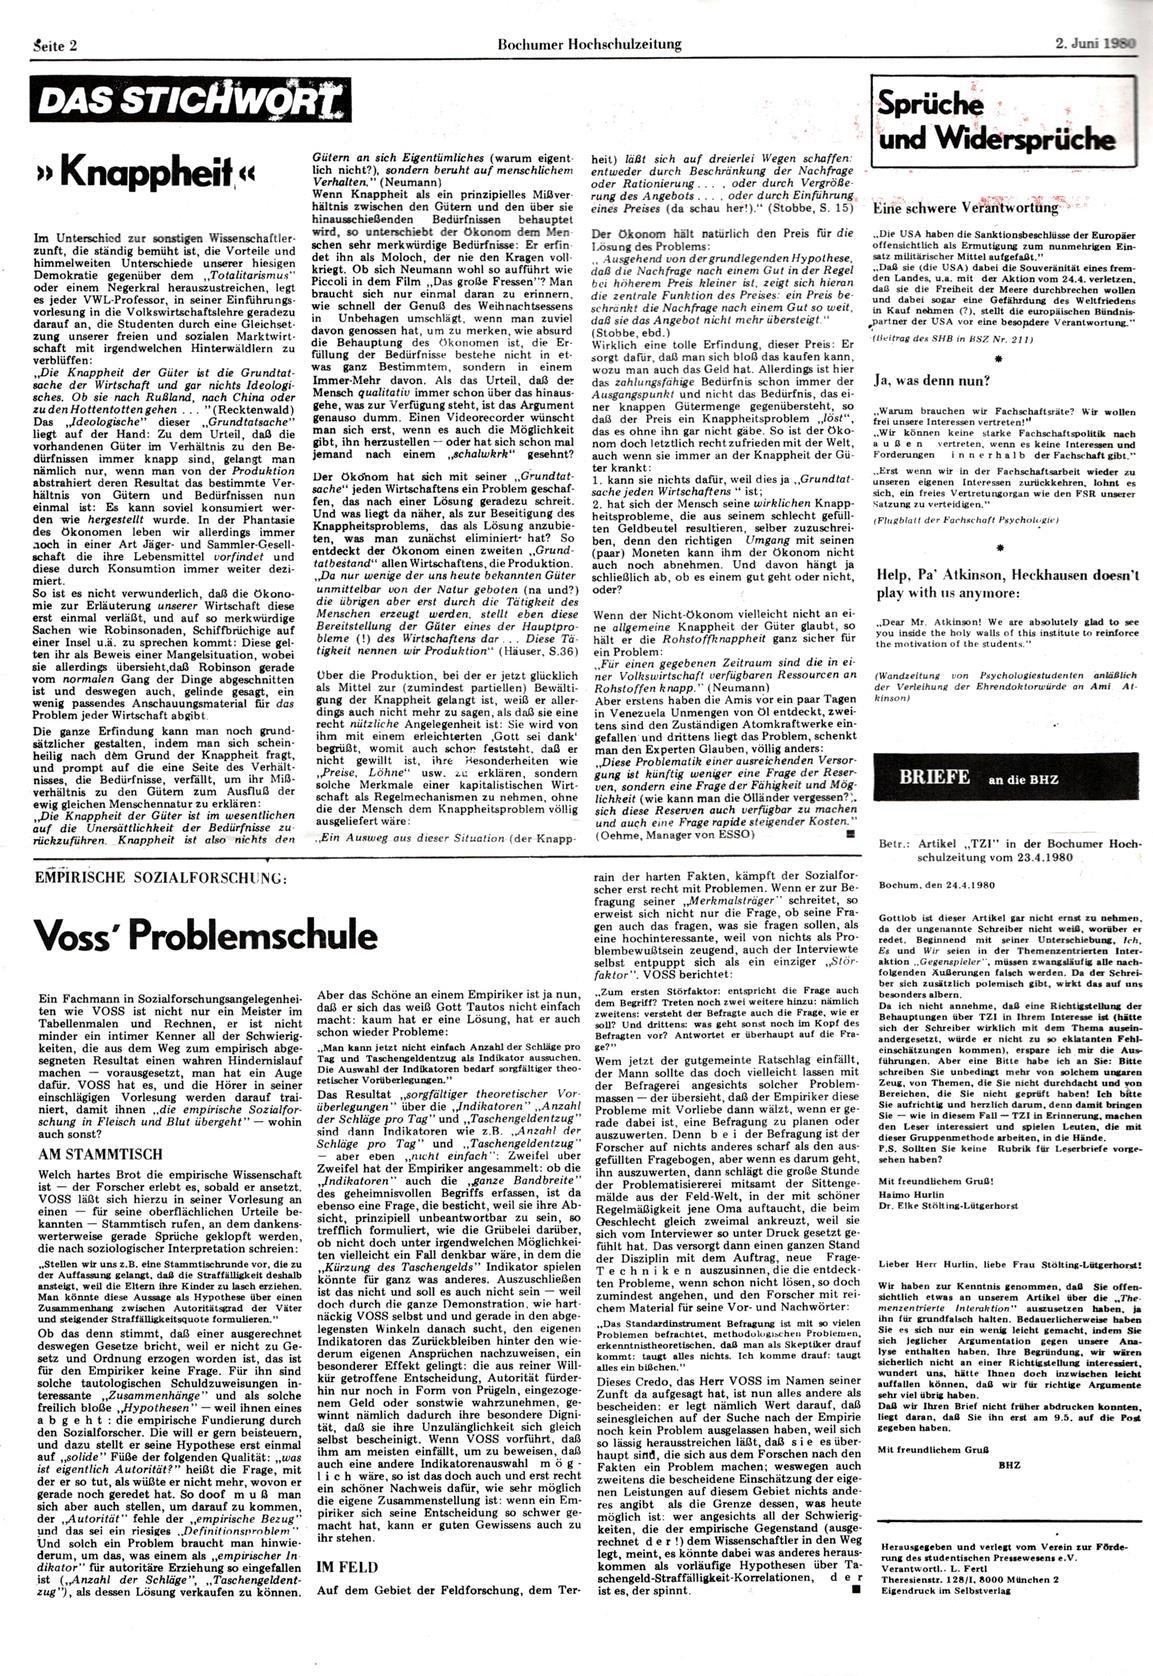 Bochum_BHZ_19800602_014_002